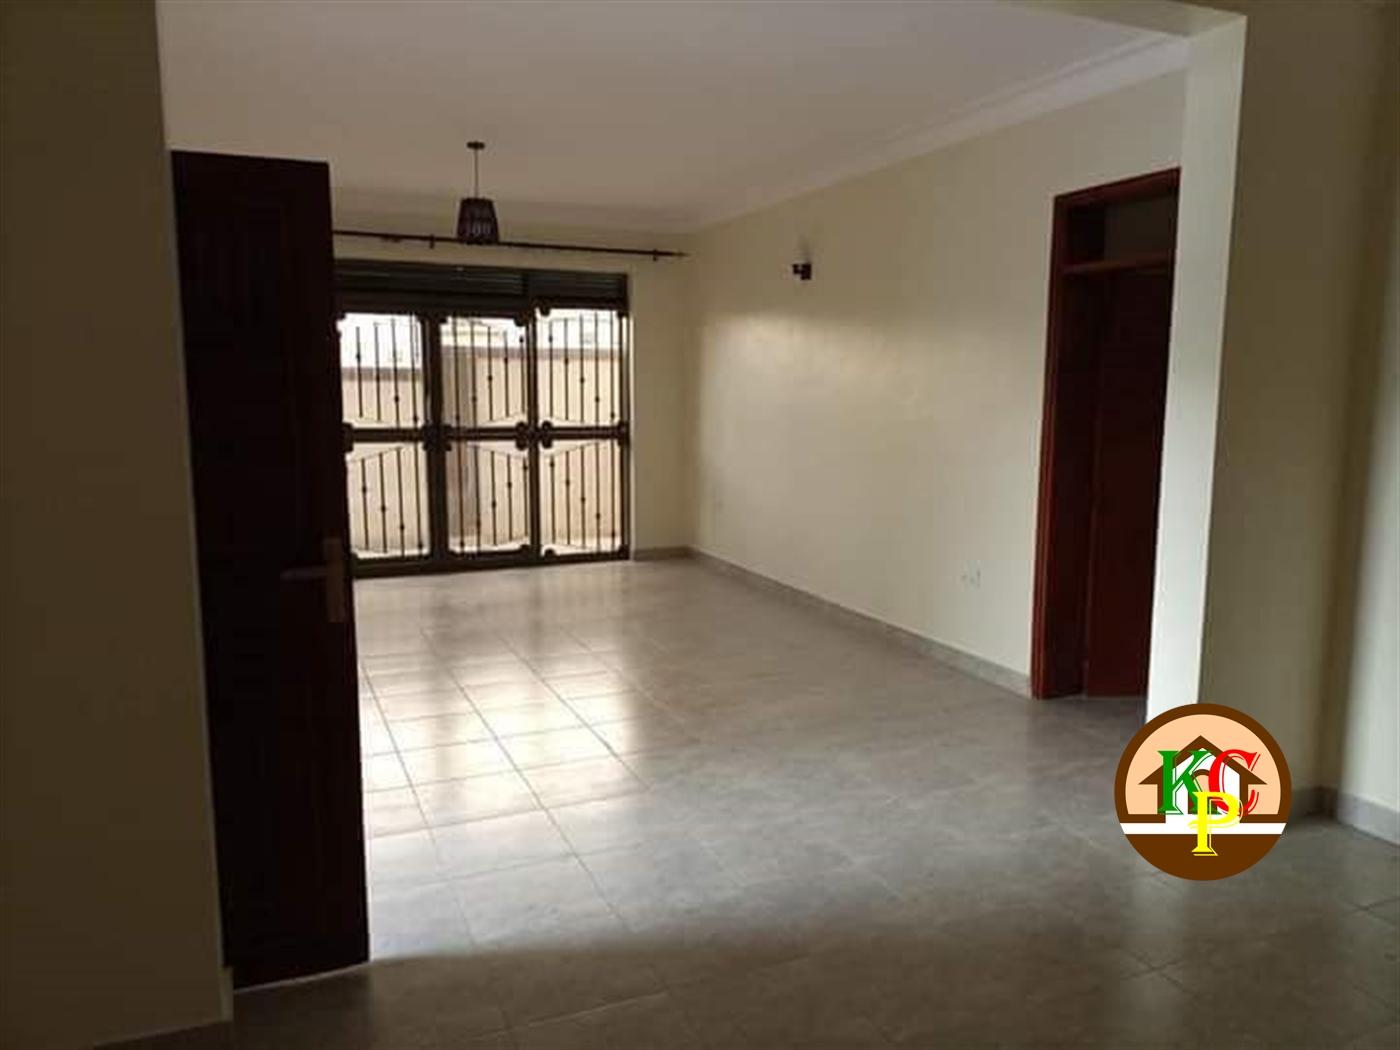 Storeyed house for sale in Seguku Wakiso